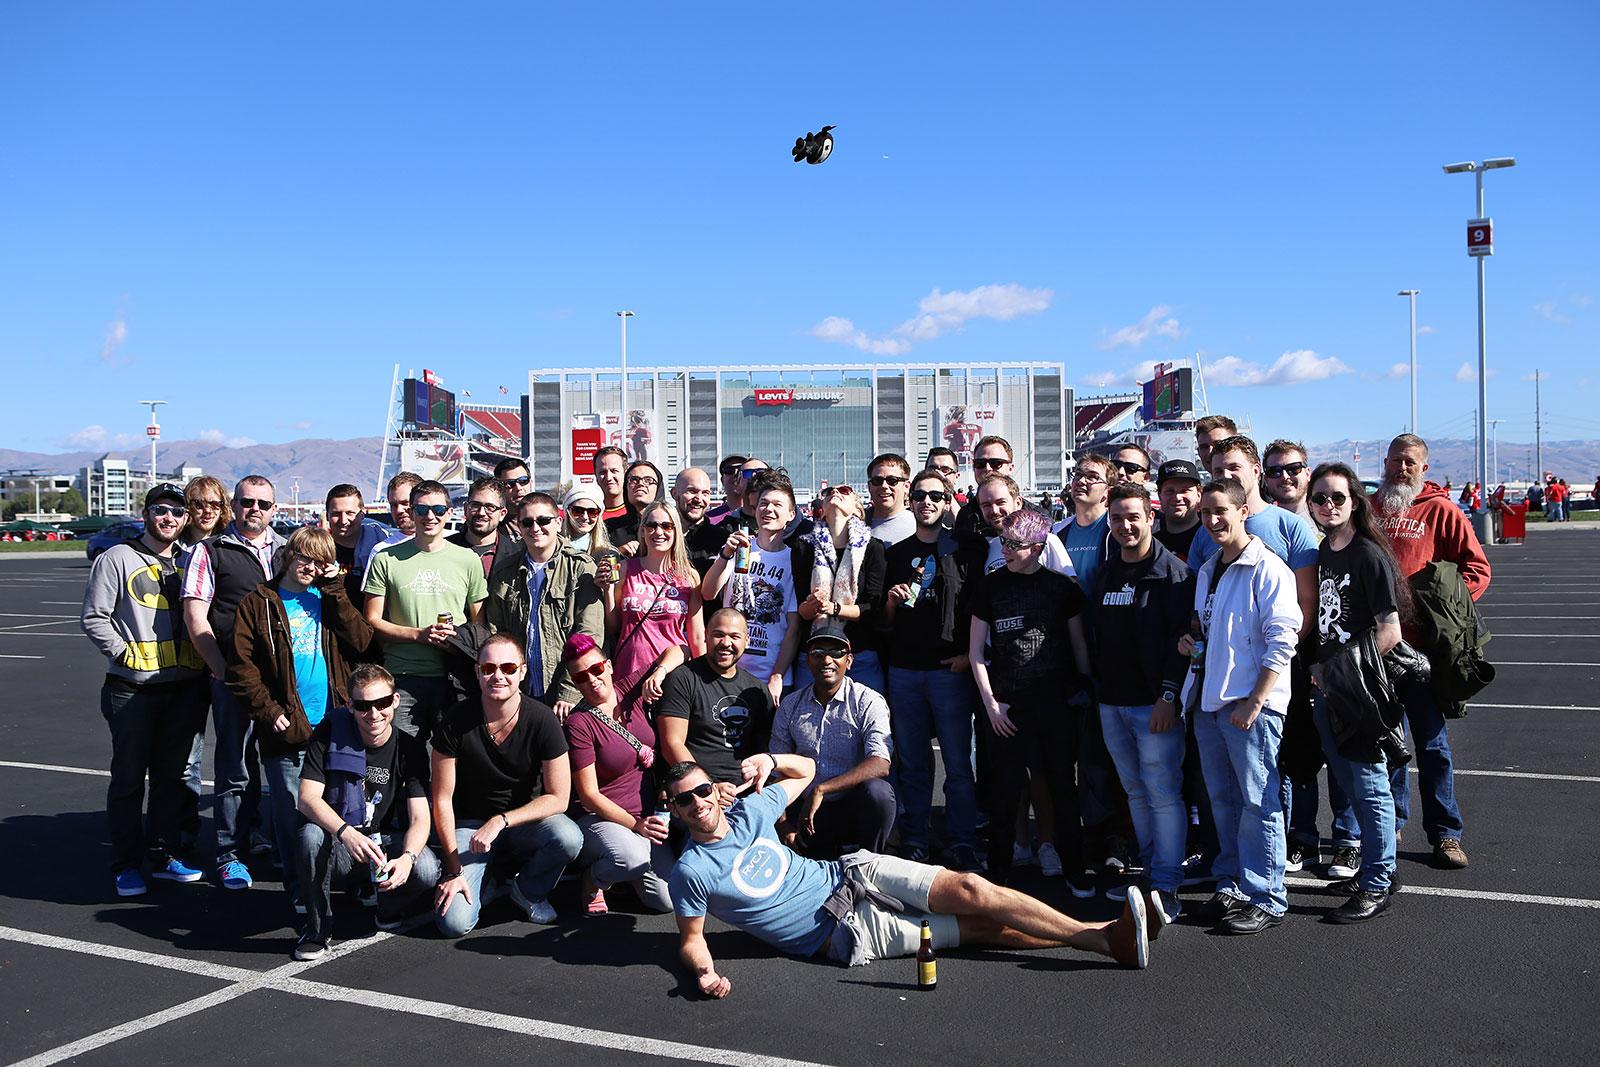 Levitating ninja at WooTrip 2014